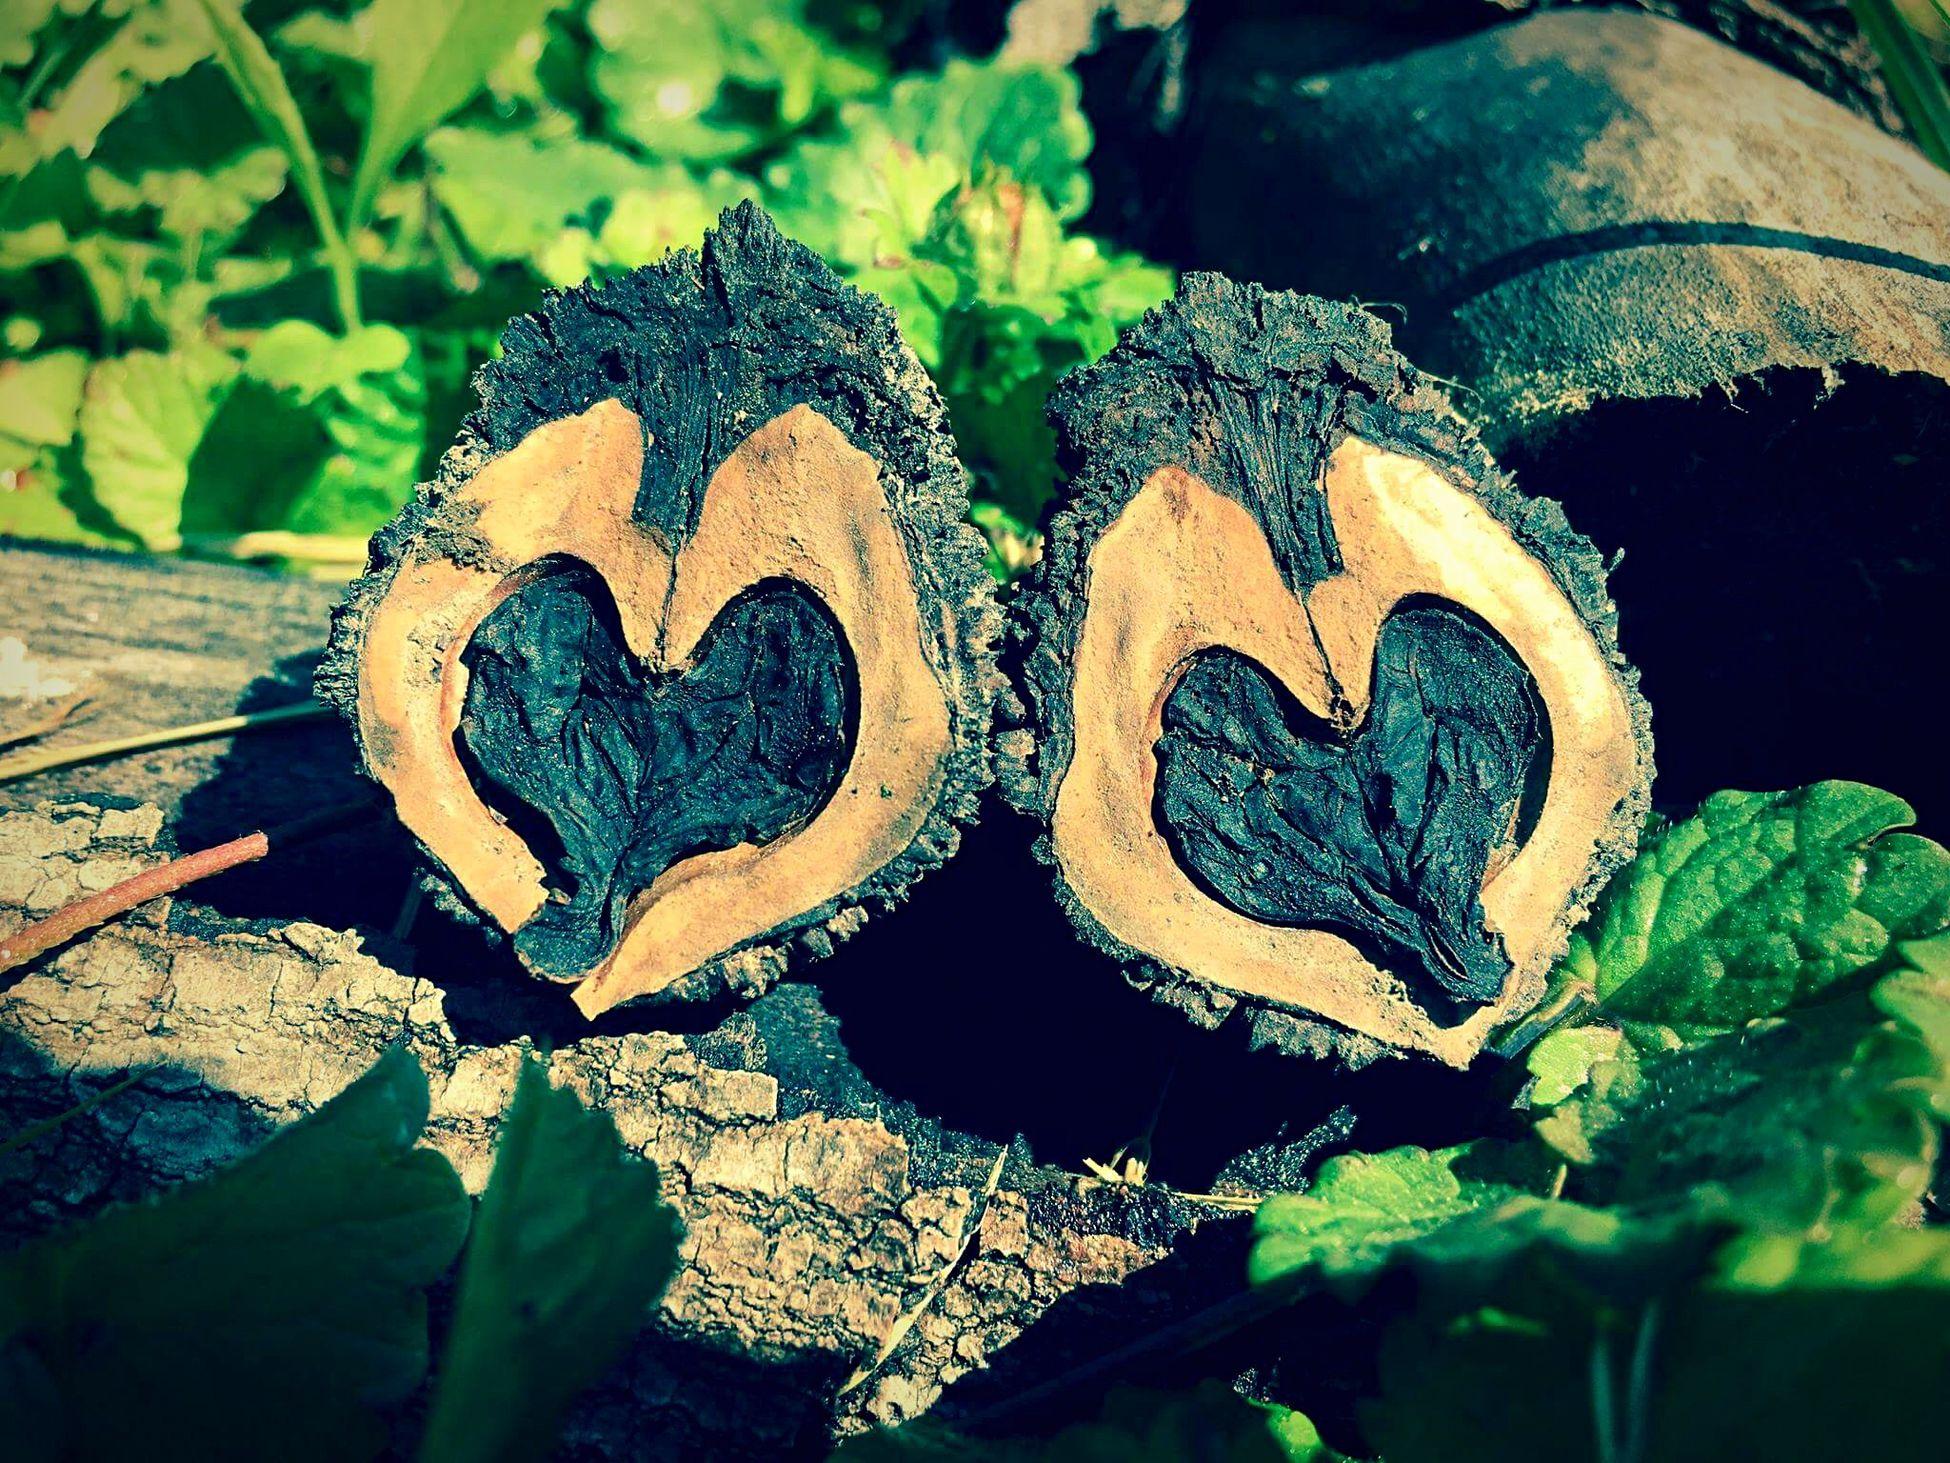 Black Walnut Black Walnut Seeds Heart Shape Love Nature Close-up Wood - Material No People Outdoors Beautiful Nature Natural Love Nature Love Nature Nature Photography Love LoveNature Shared Hearts Hearts In Nature Heartshape